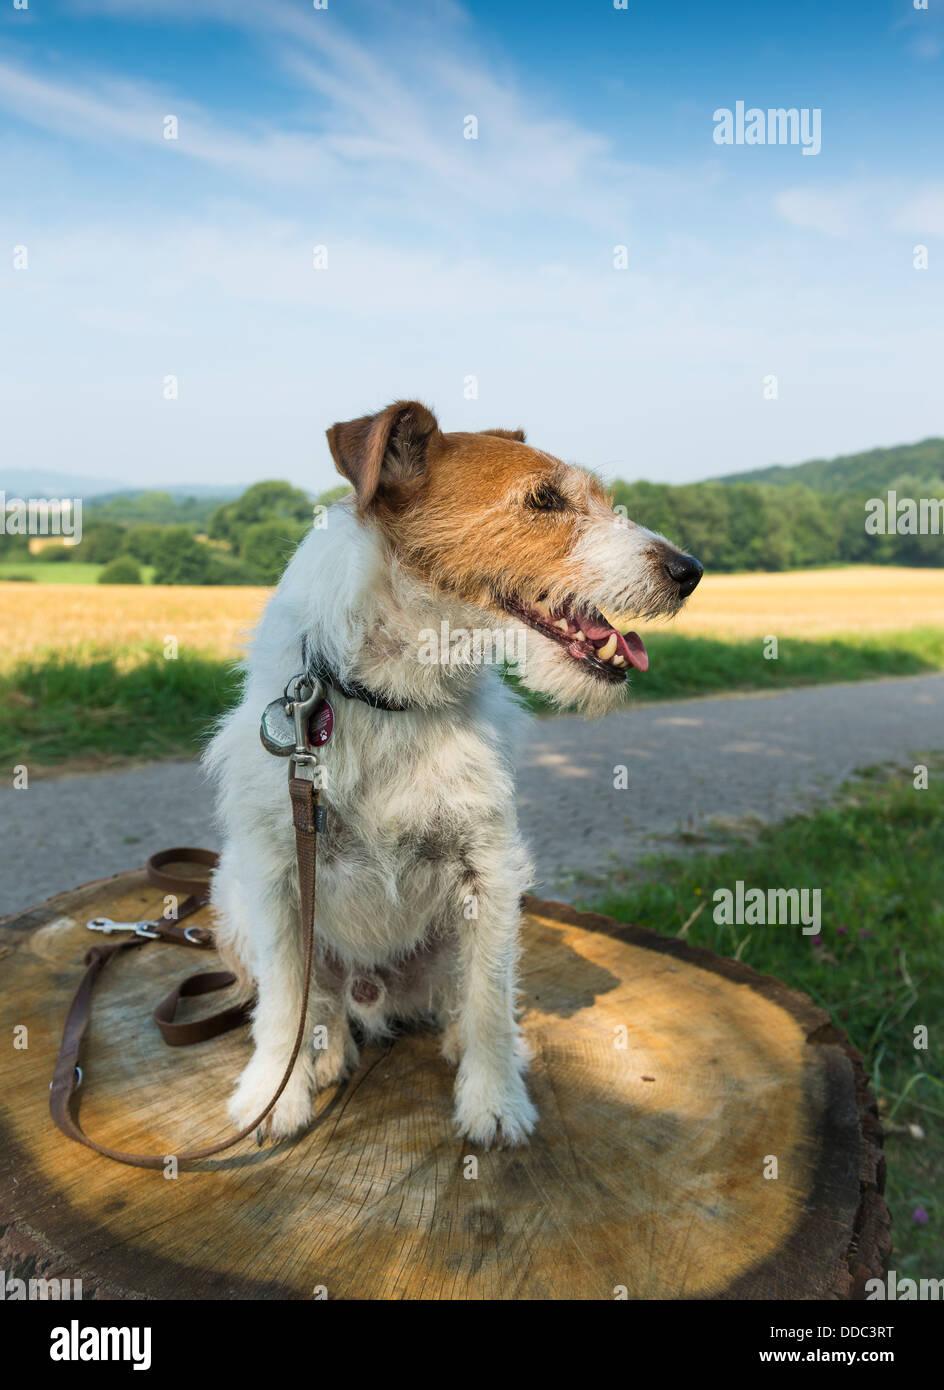 Jack Russell Terrier Sat on Tree Stump - Stock Image